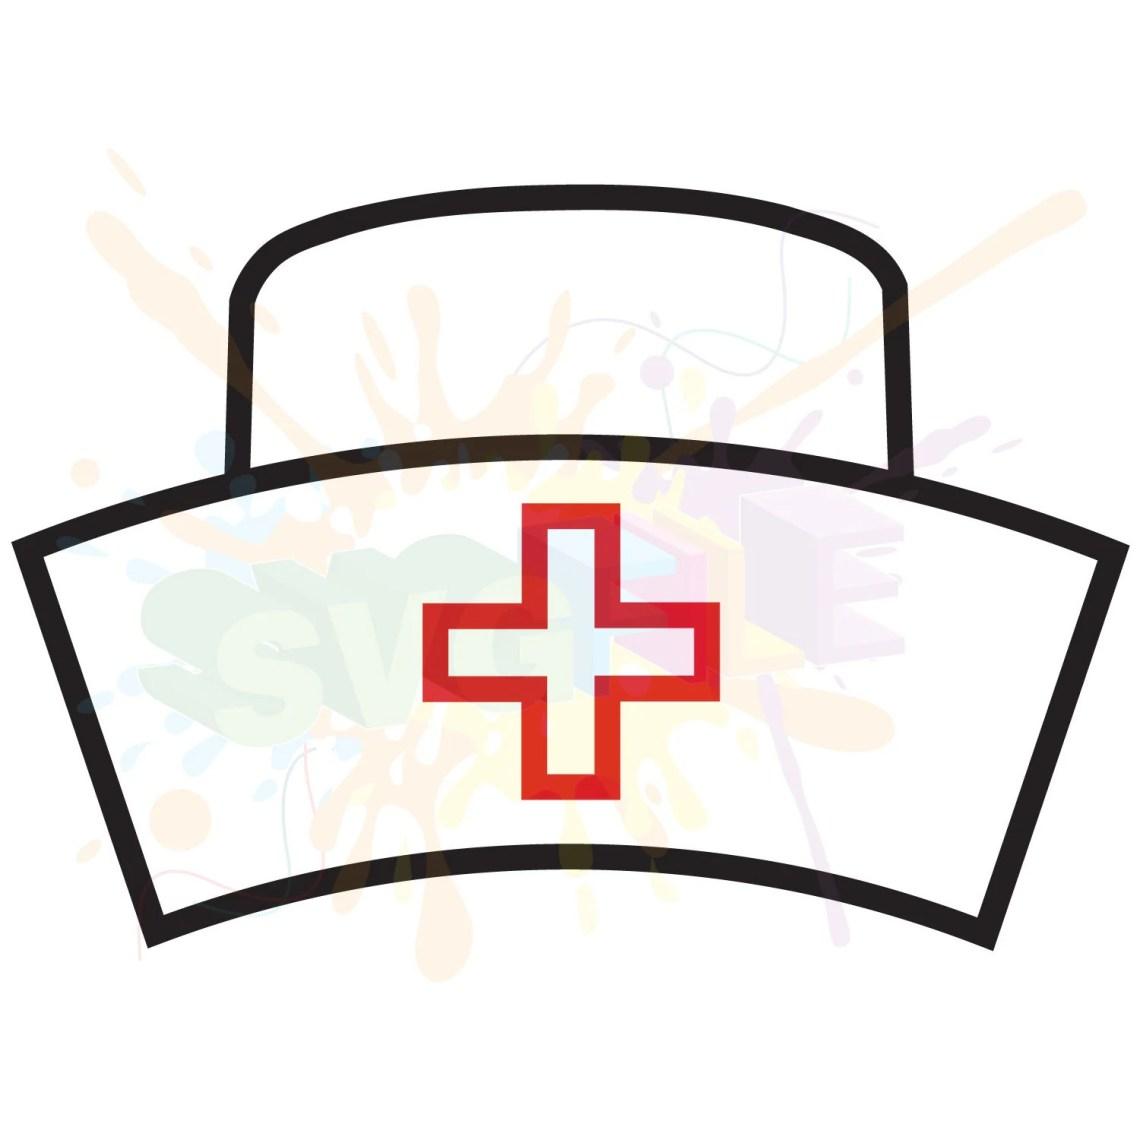 Download Nurse SVG Files For Silhouette Studio and Cricut Design Space.